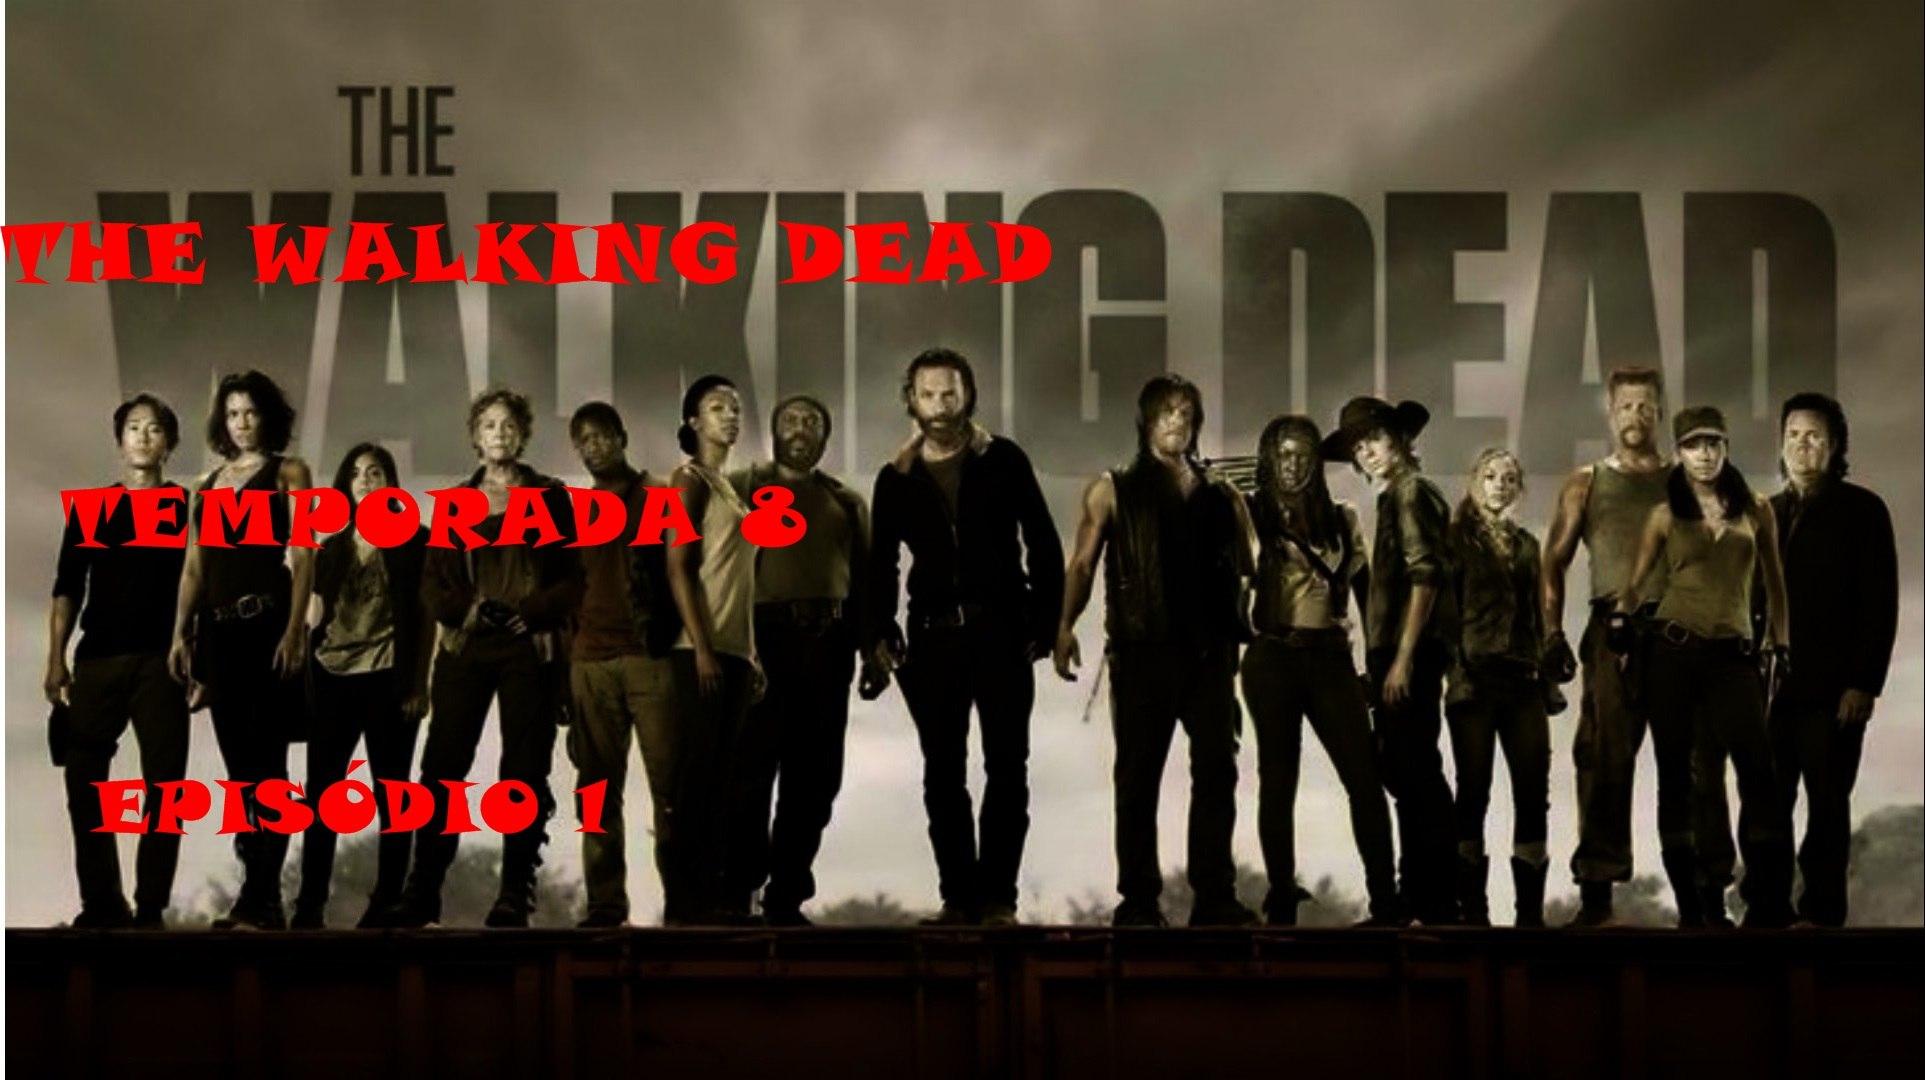 The Walking Dead T-8 Ep1 Dublado.